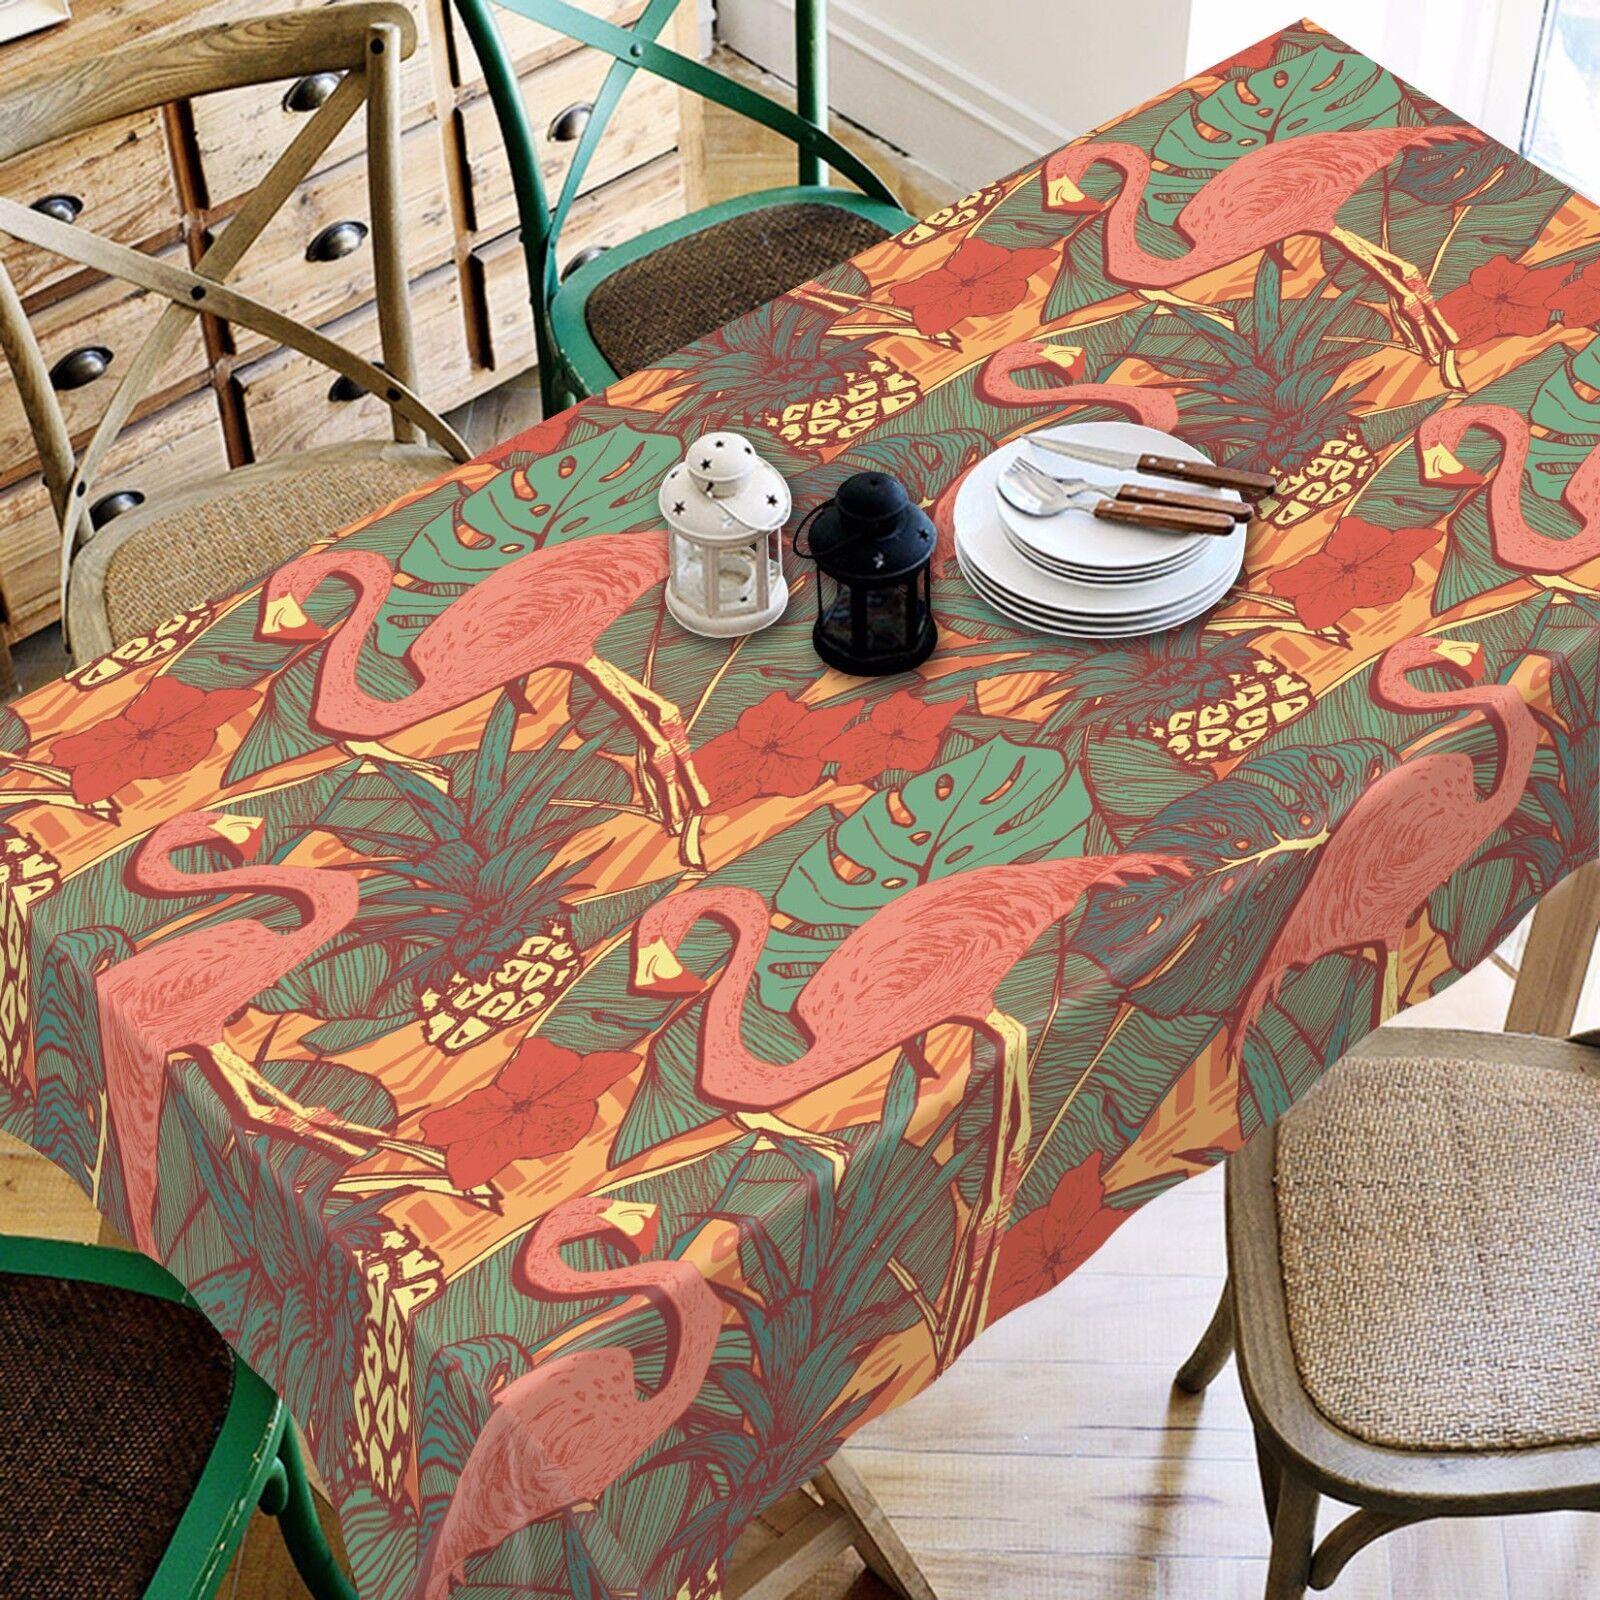 3D Cranes 4393 Tablecloth Table Cover Cloth Birthday Party Event AJ WALLPAPER AU